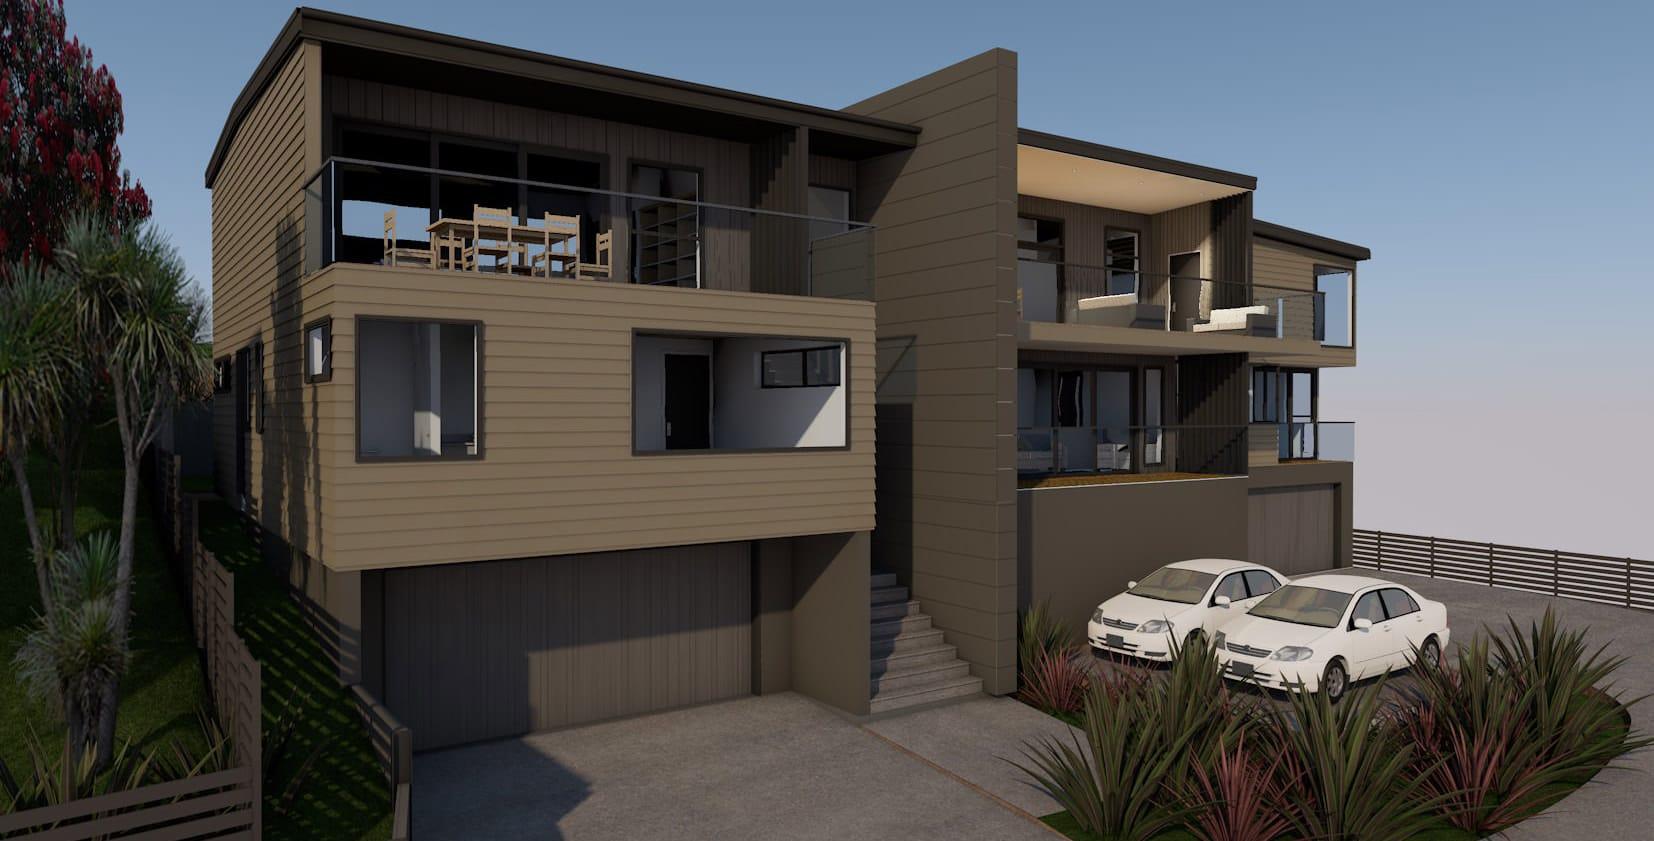 Matakiakia Duplex - Whangaparoa, Auckland - Side